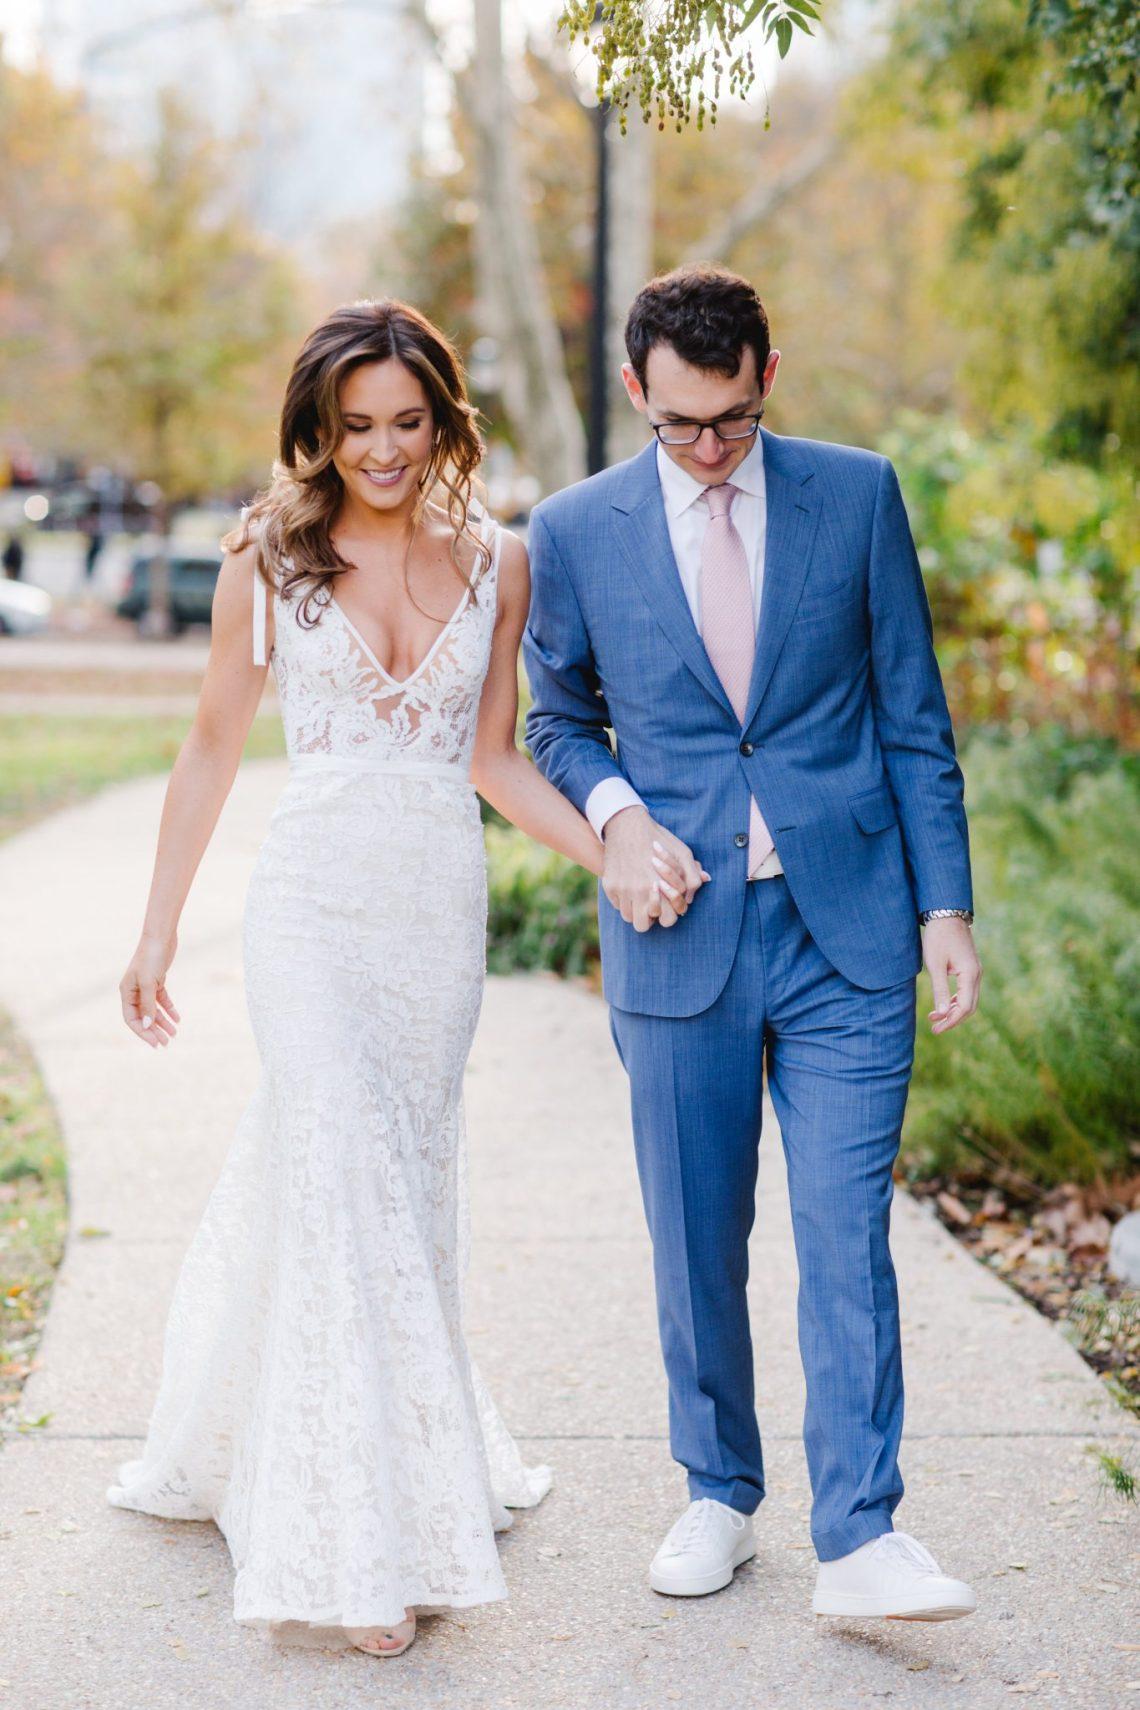 Fall Wedding at The Barnes Foundation in Philadelphia | www.thestyledbride.com